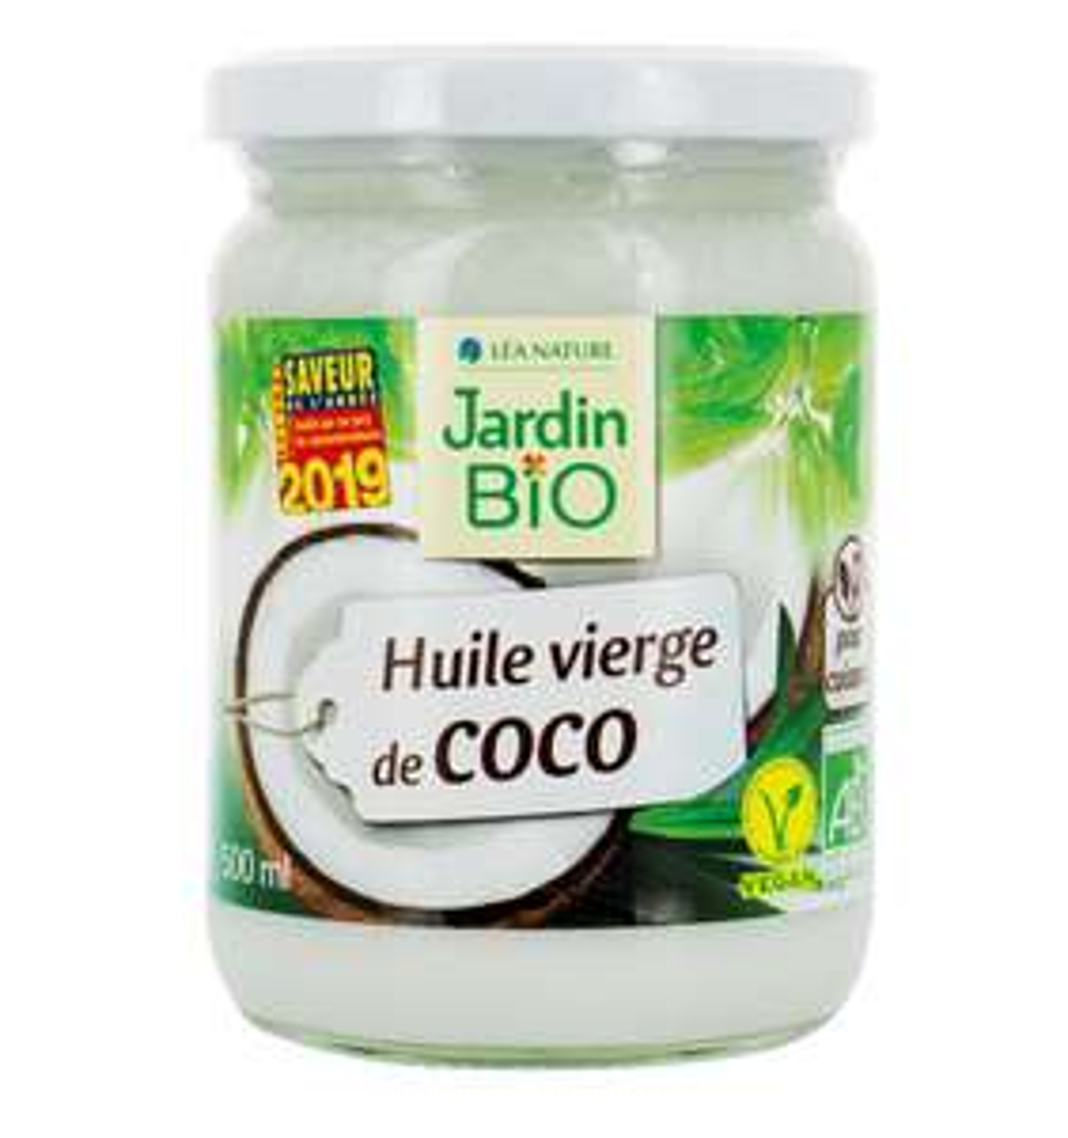 Lot de 3 pots Huile de coco vierge bio Jardin Bio - 3 x 500 ml